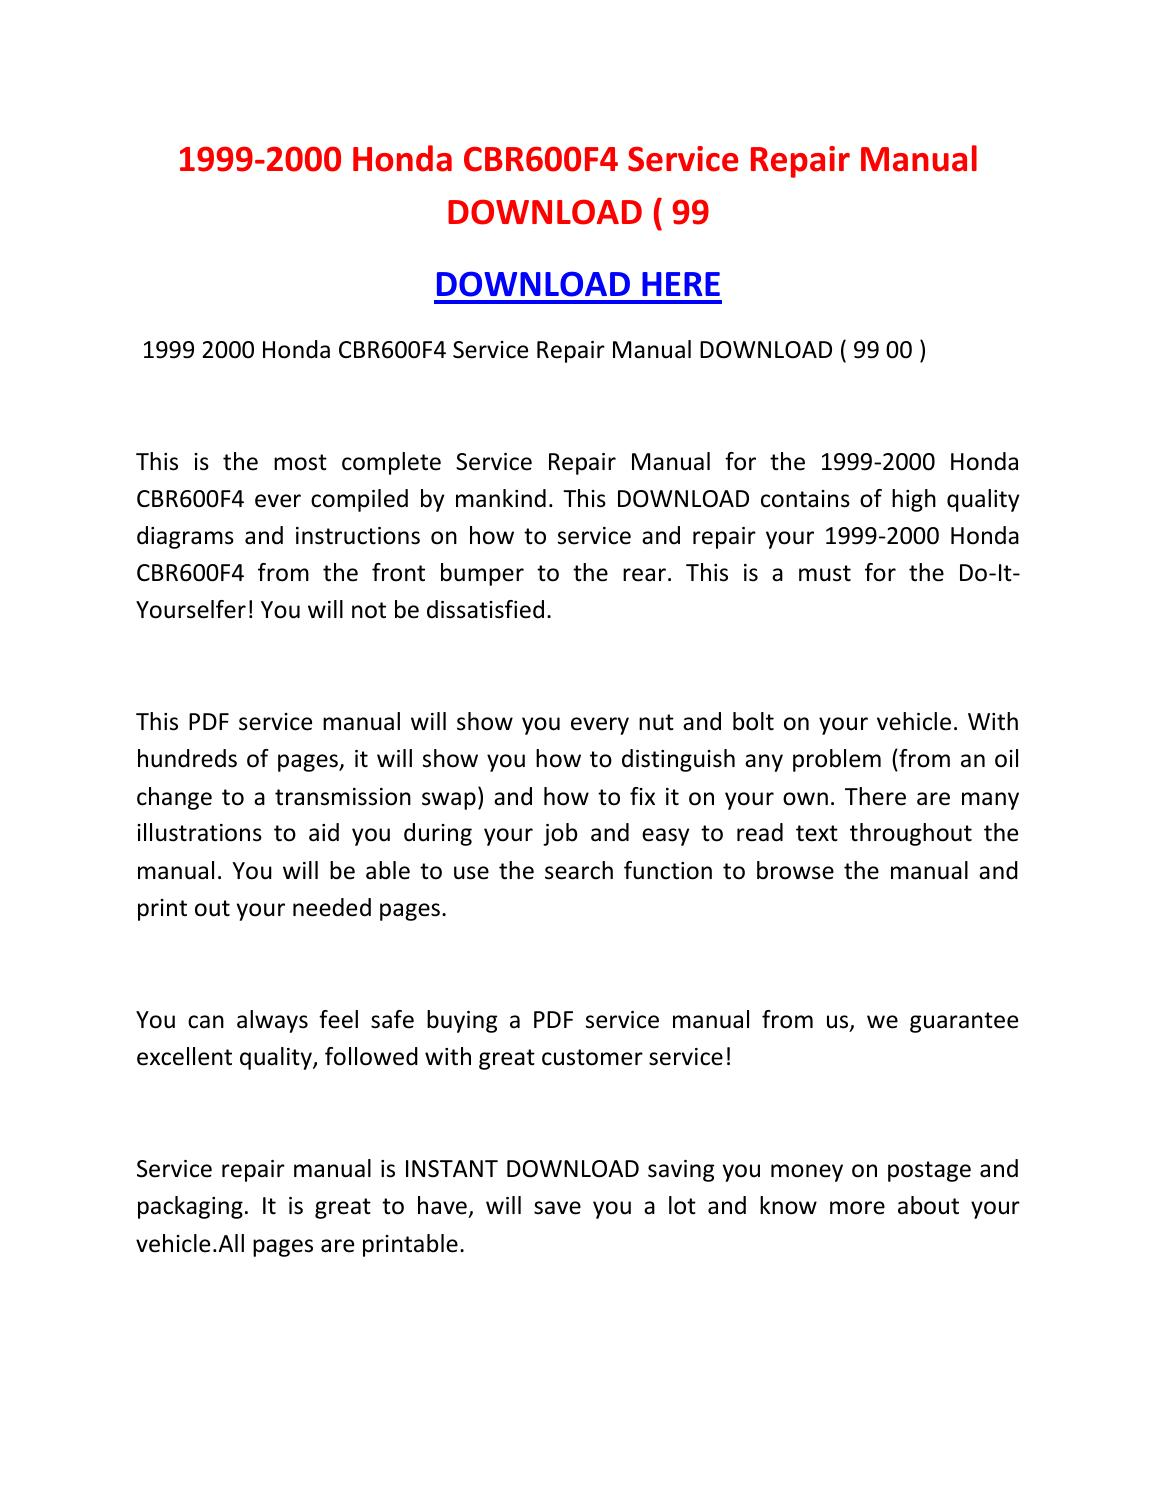 1999 2000 honda cbr600f4 service repair manual download. Black Bedroom Furniture Sets. Home Design Ideas